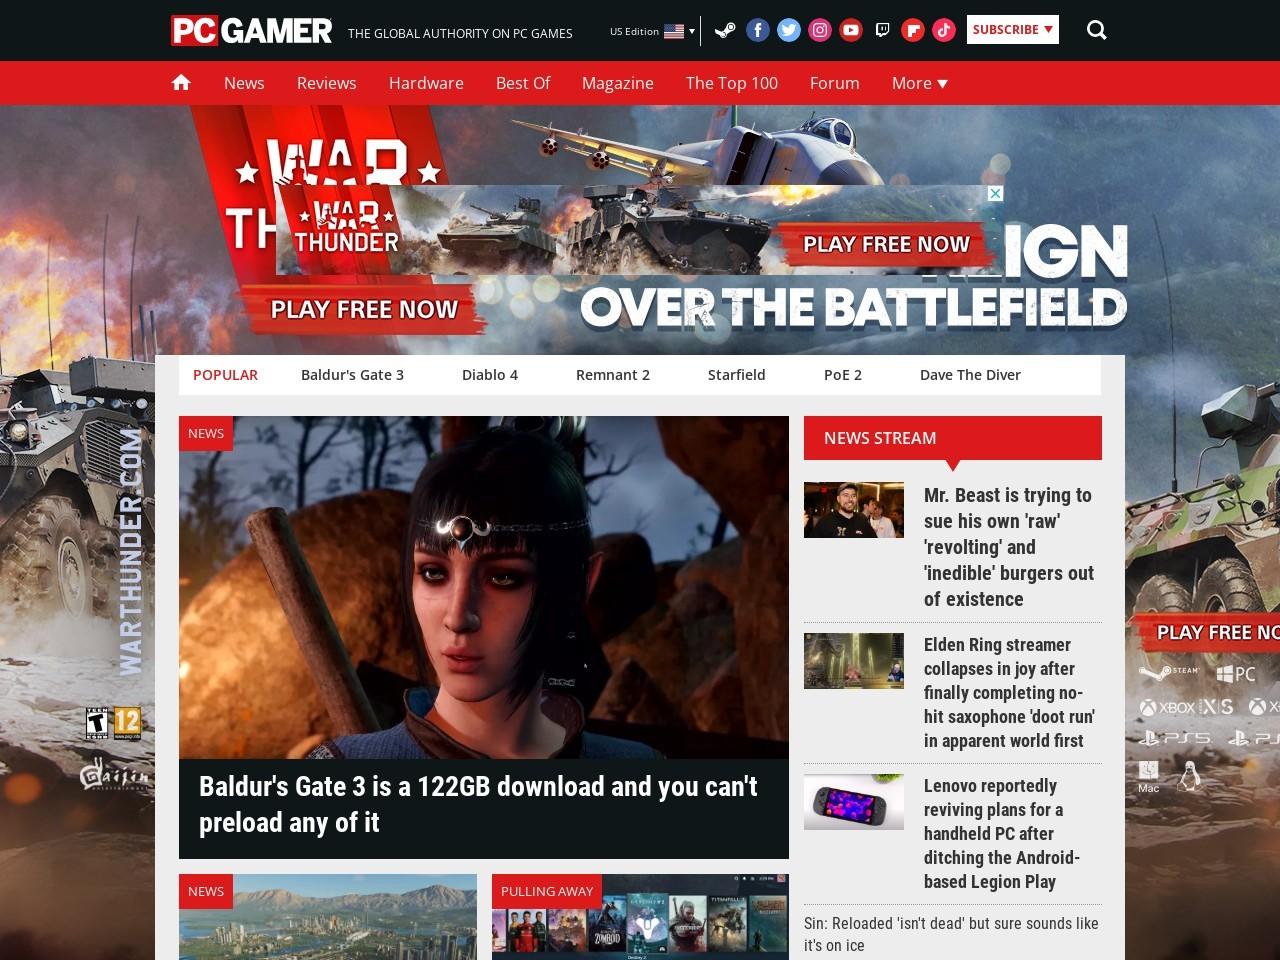 The 10 best Portal 2 co-op maps | PC Gamer